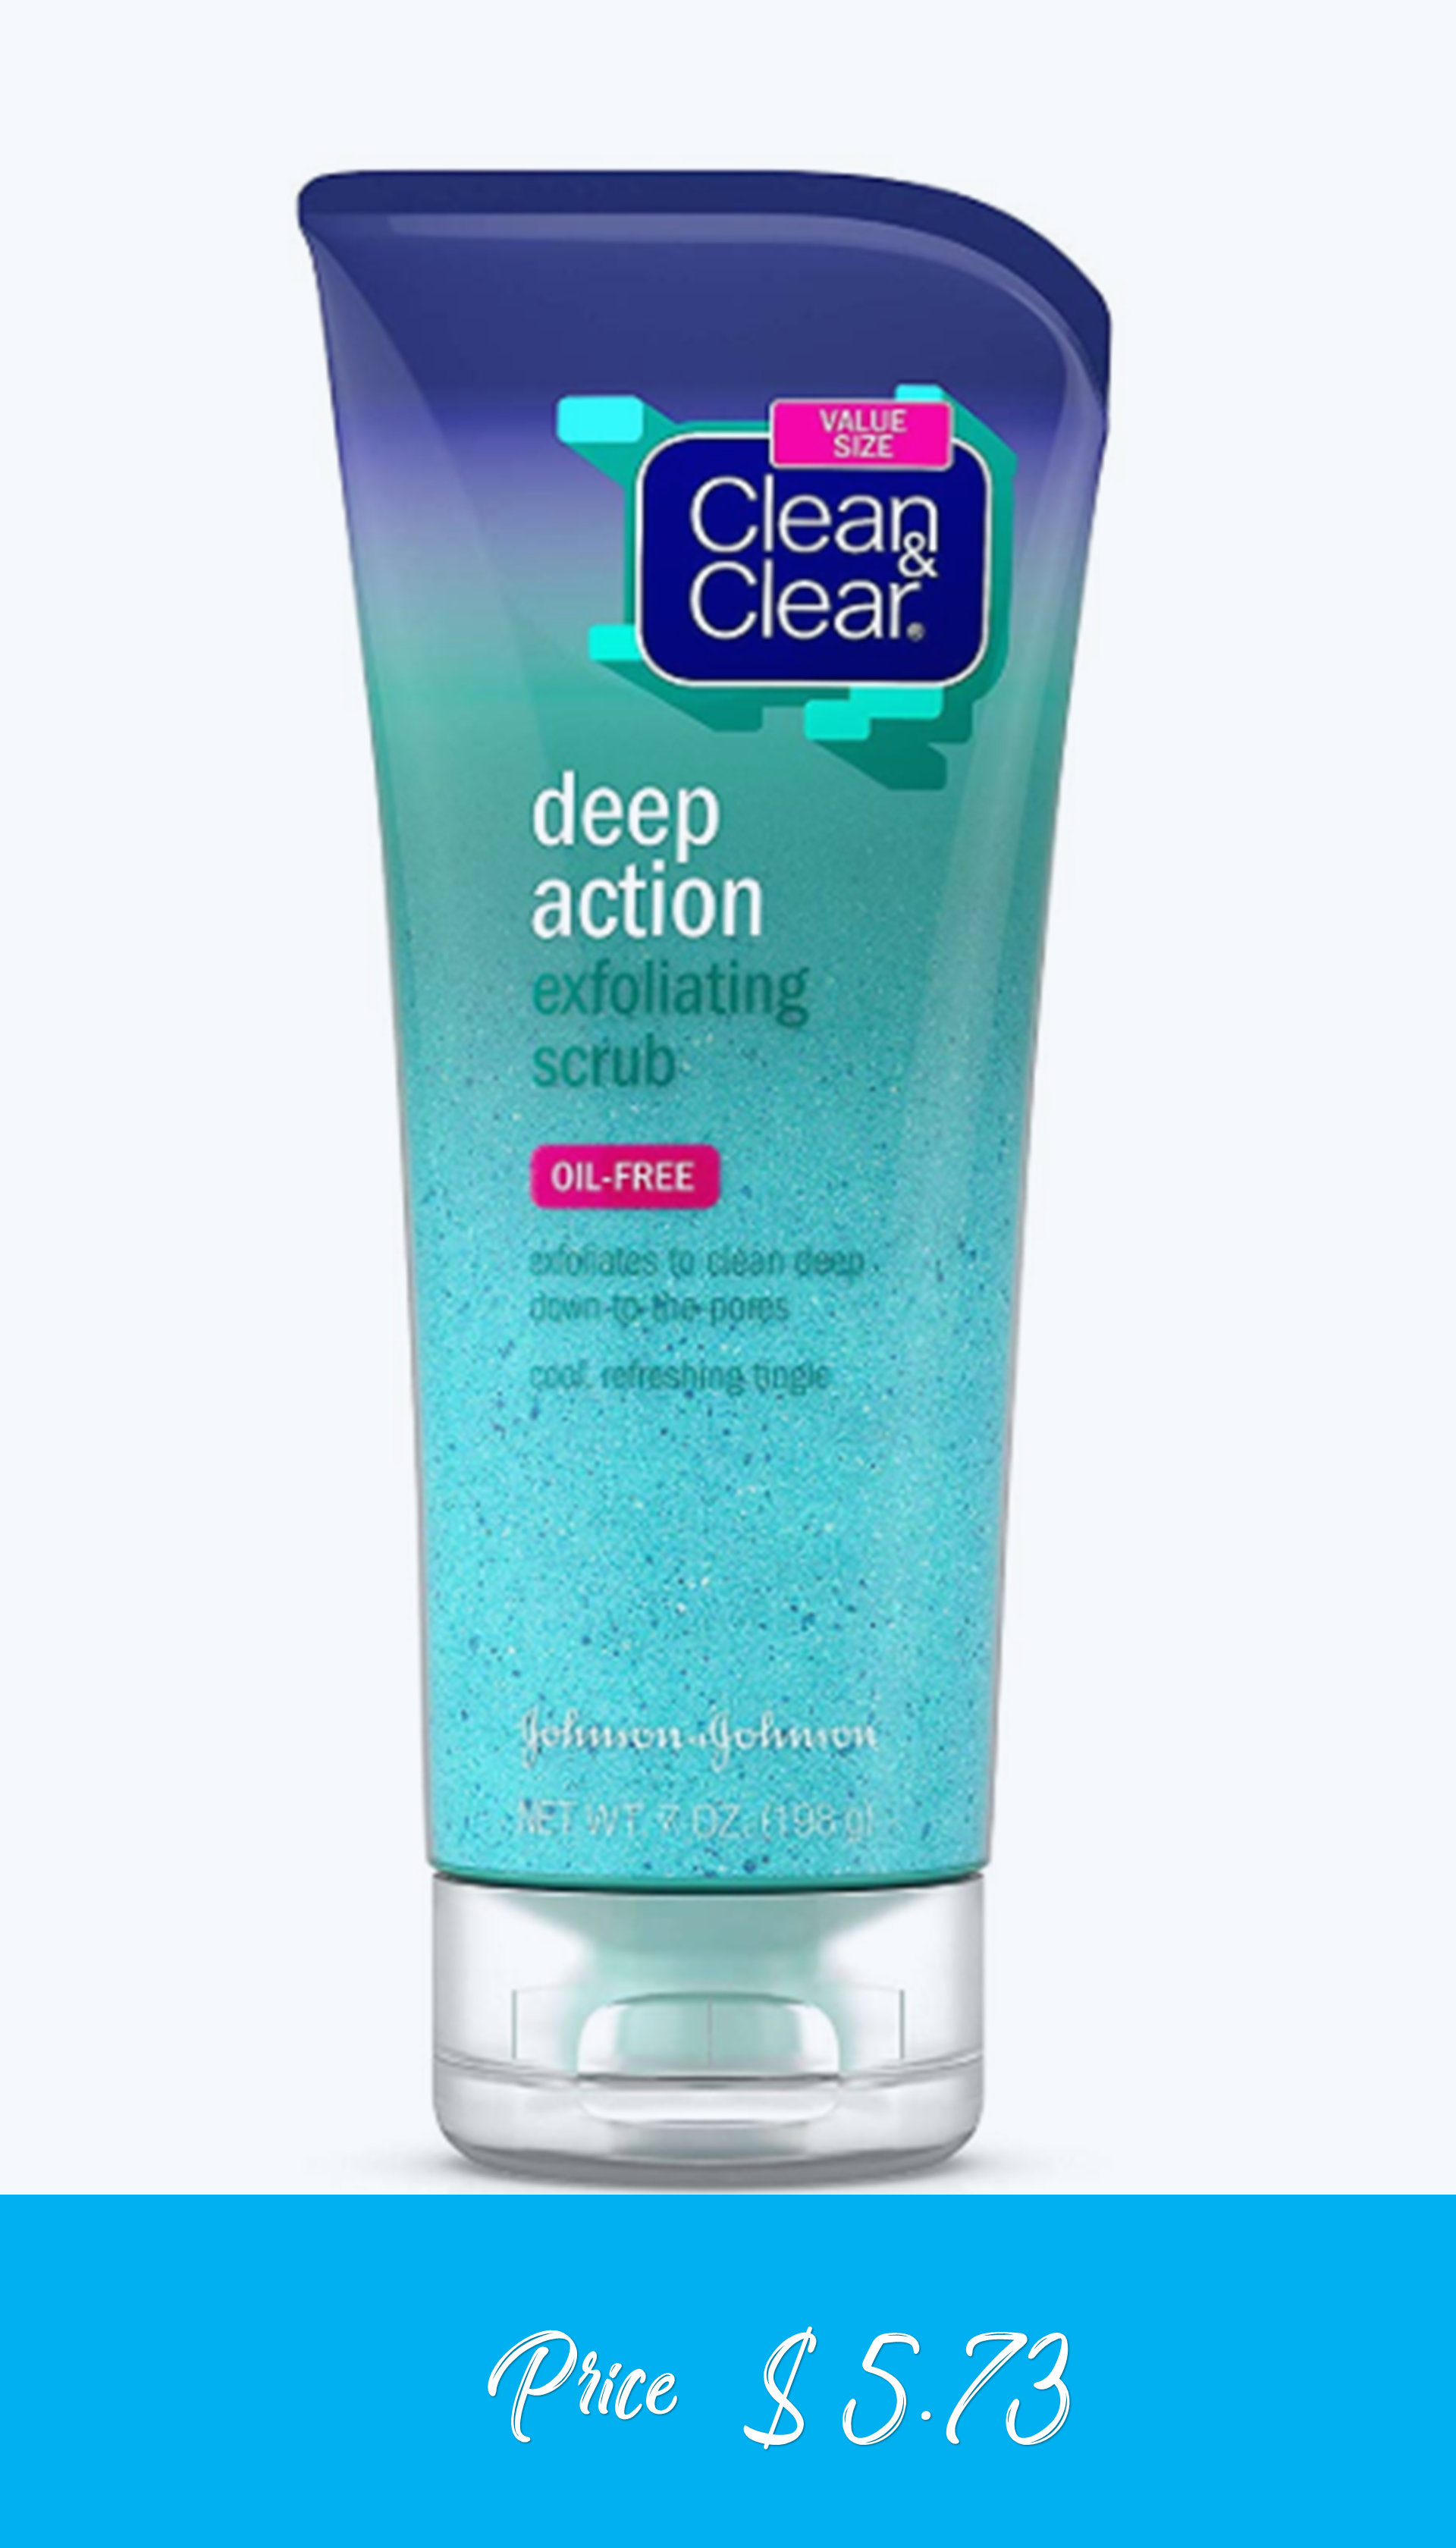 Clean Clear Oil Free Deep Action Exfoliating Facial Scrub